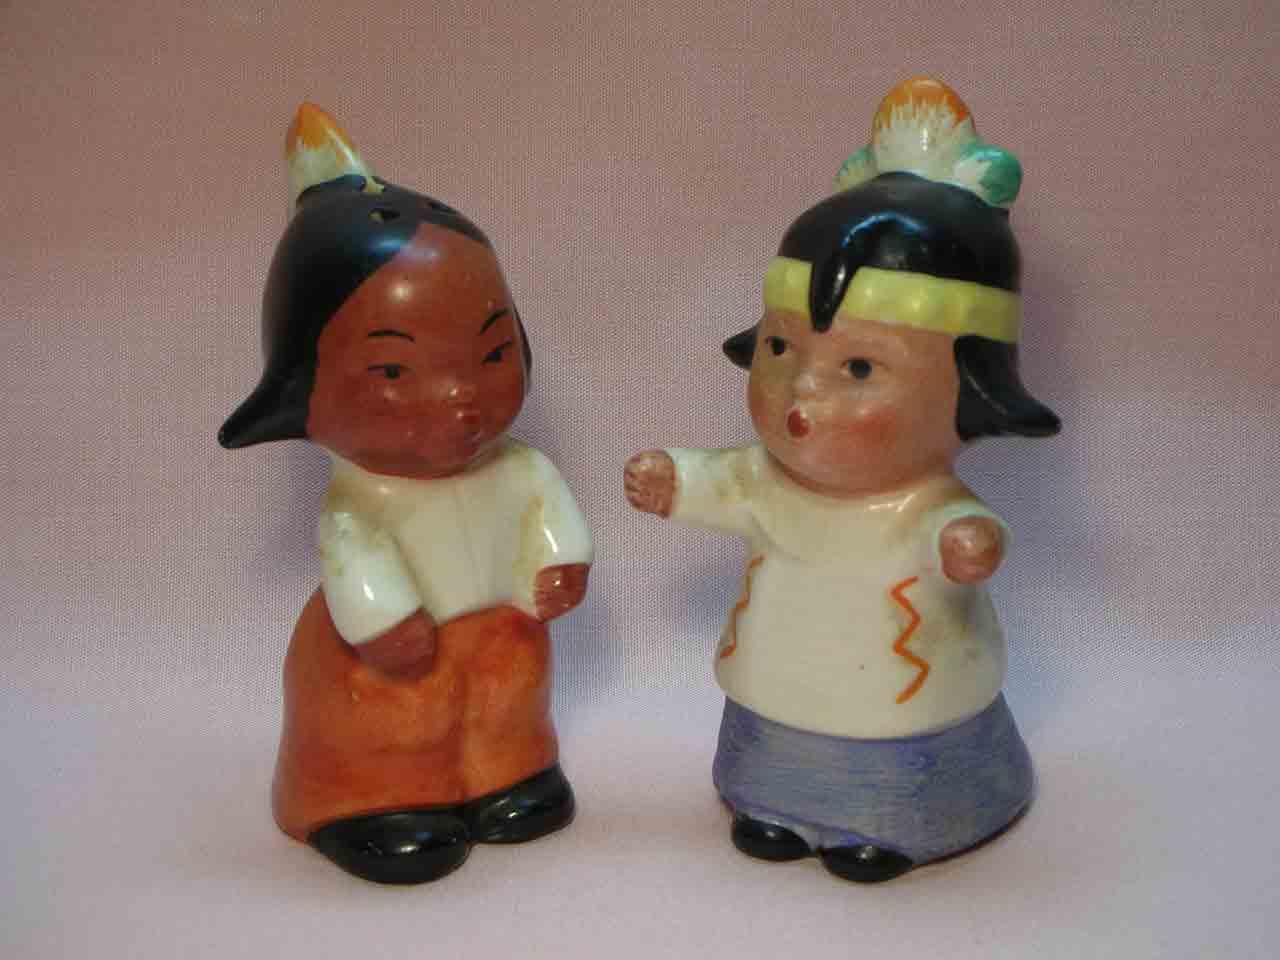 Goebel huggers salt and pepper shakers - Indians